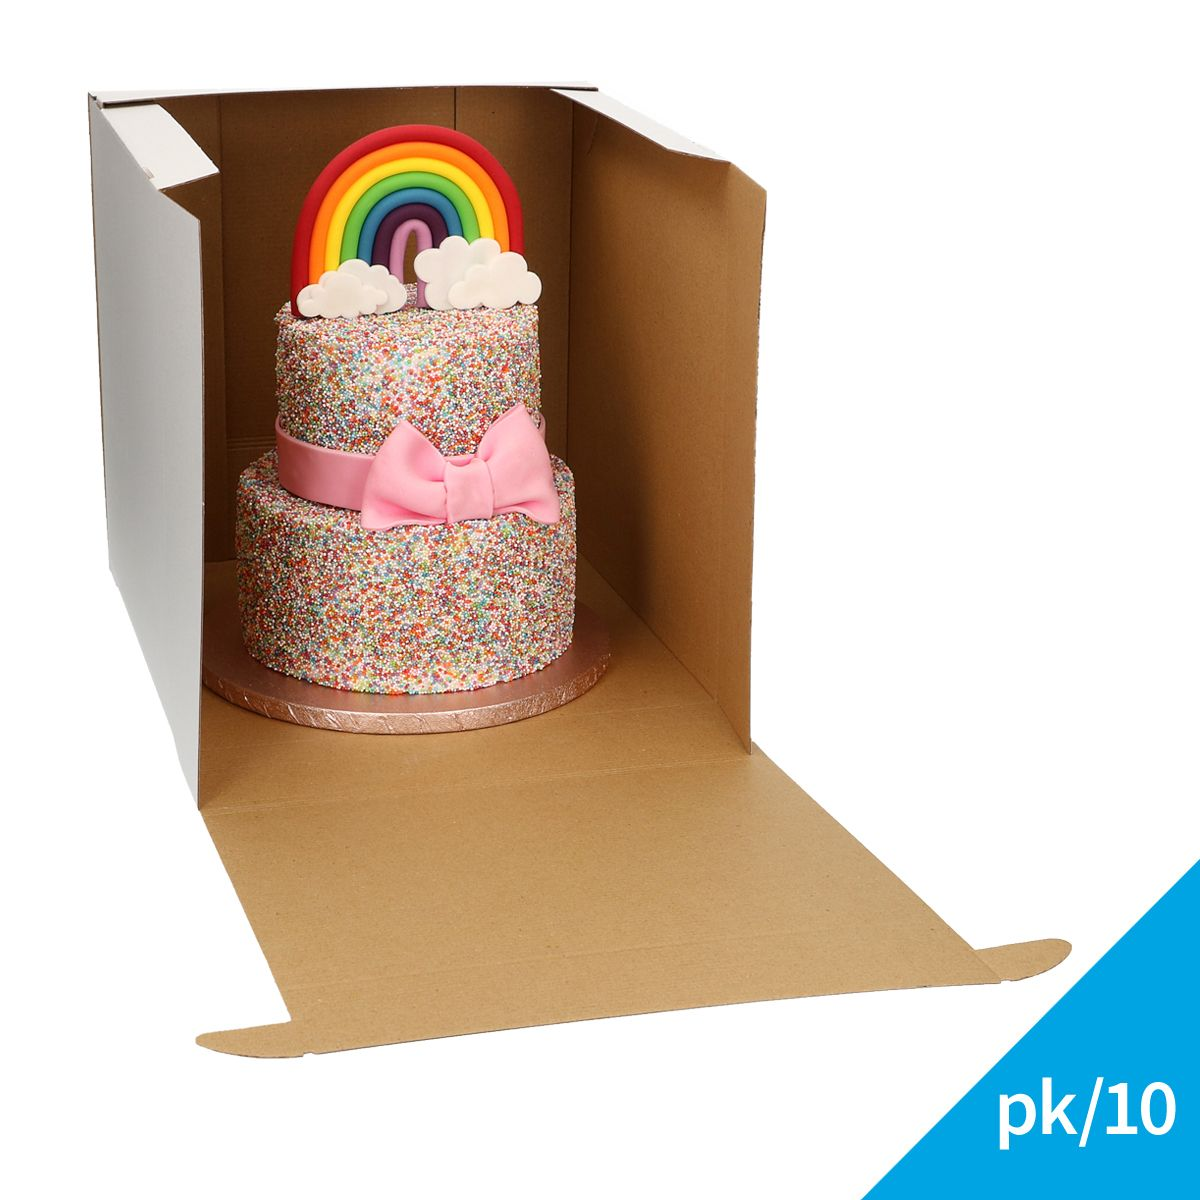 Boite à gâteau Solide XL - 32 x 32 Cm